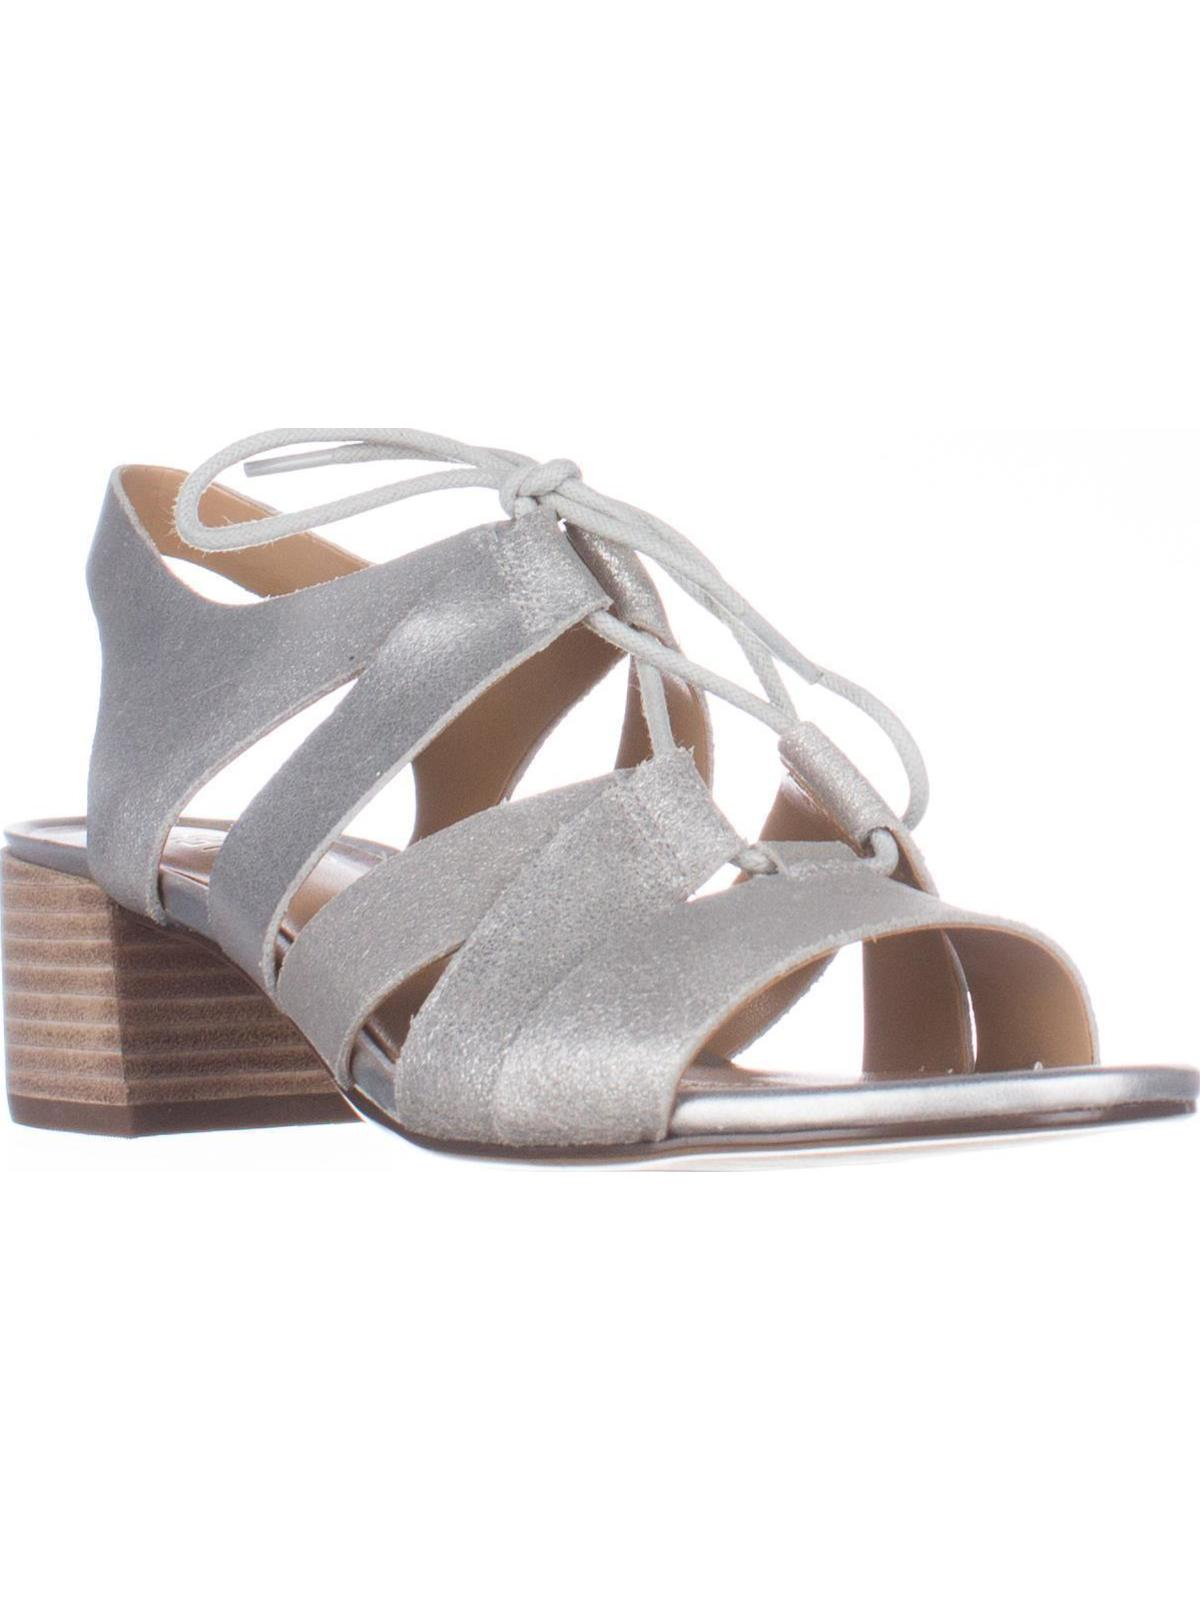 60577da03e2 naturalizer Felicity Block Heel Lace Up Sandals